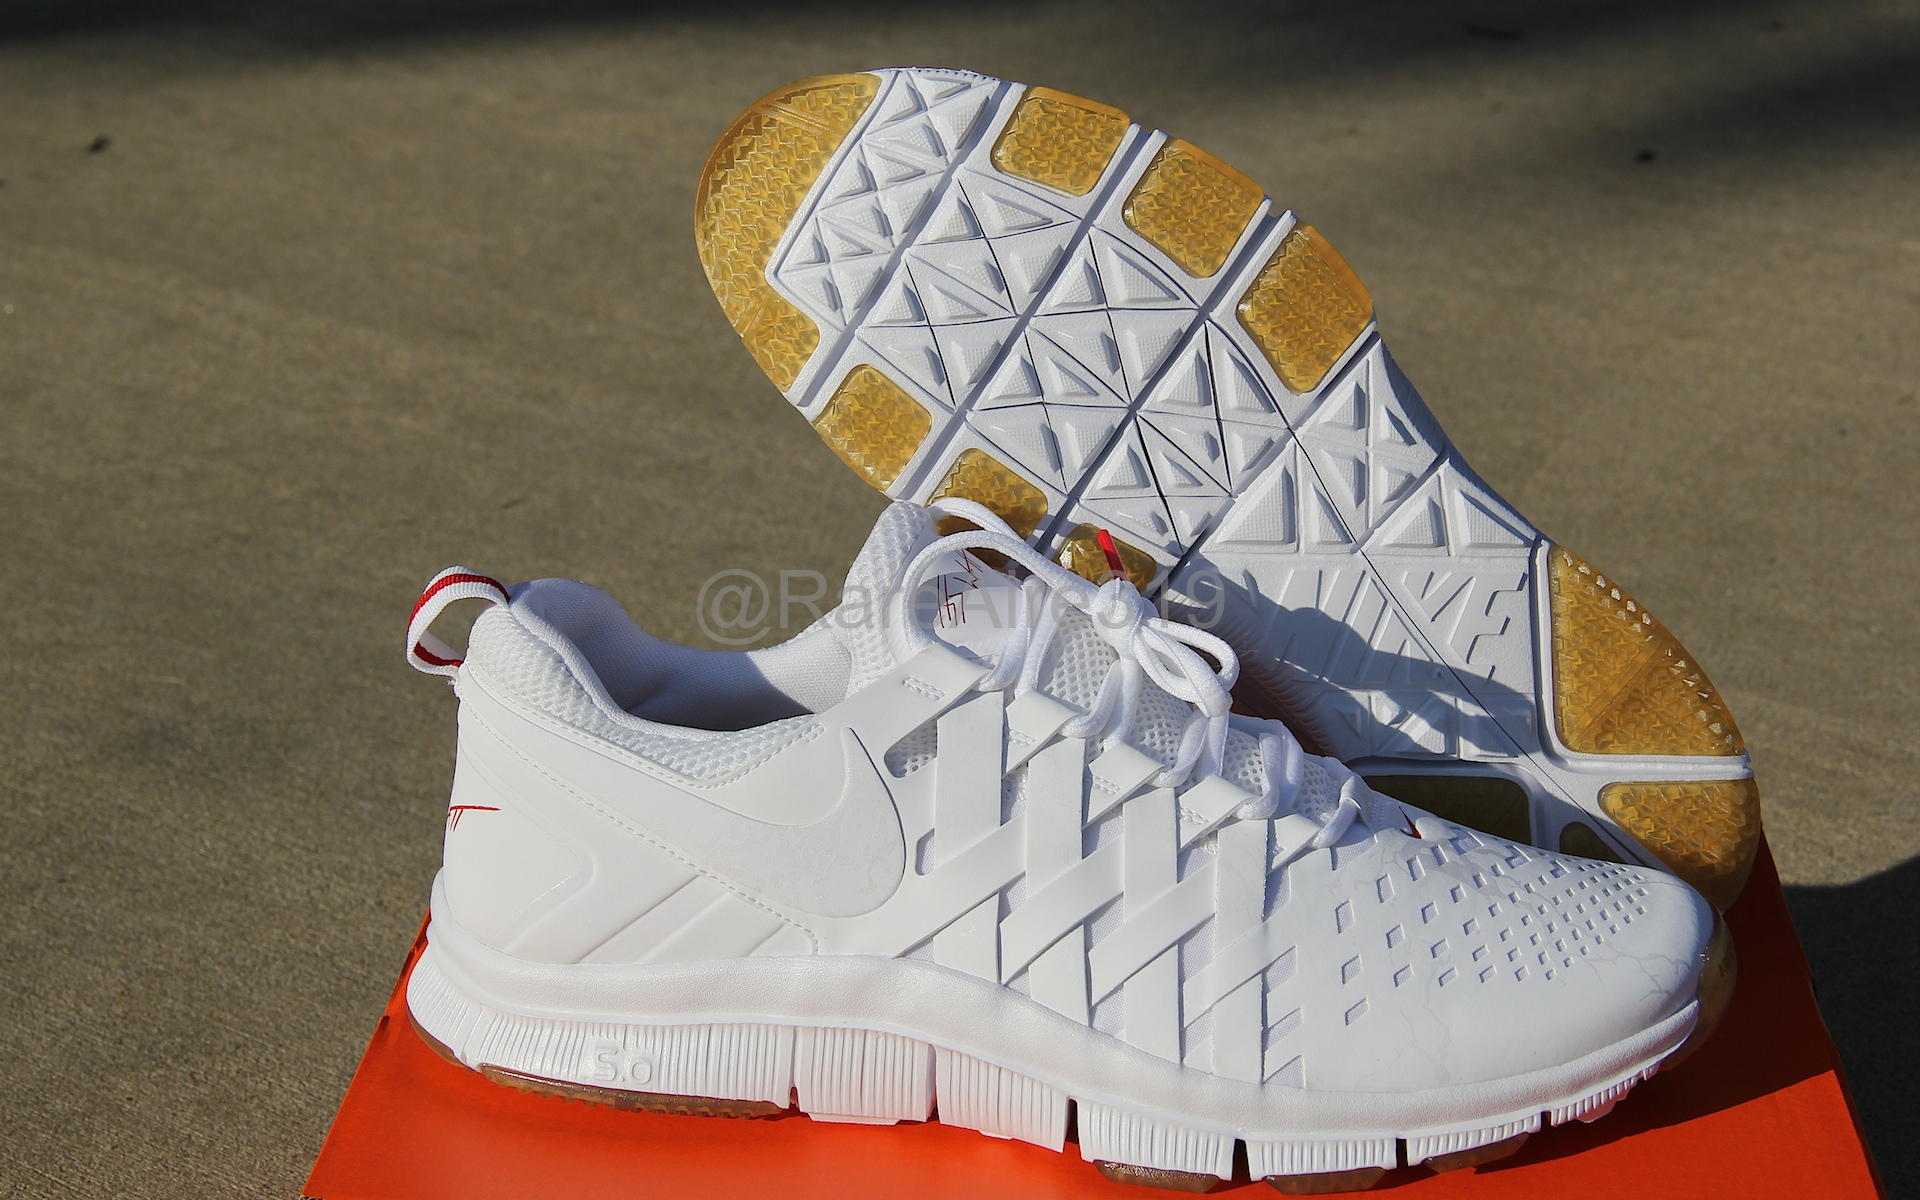 062df998169 ... nike free trainer 5.0 jj watt  mirin new gym shoes the new ...